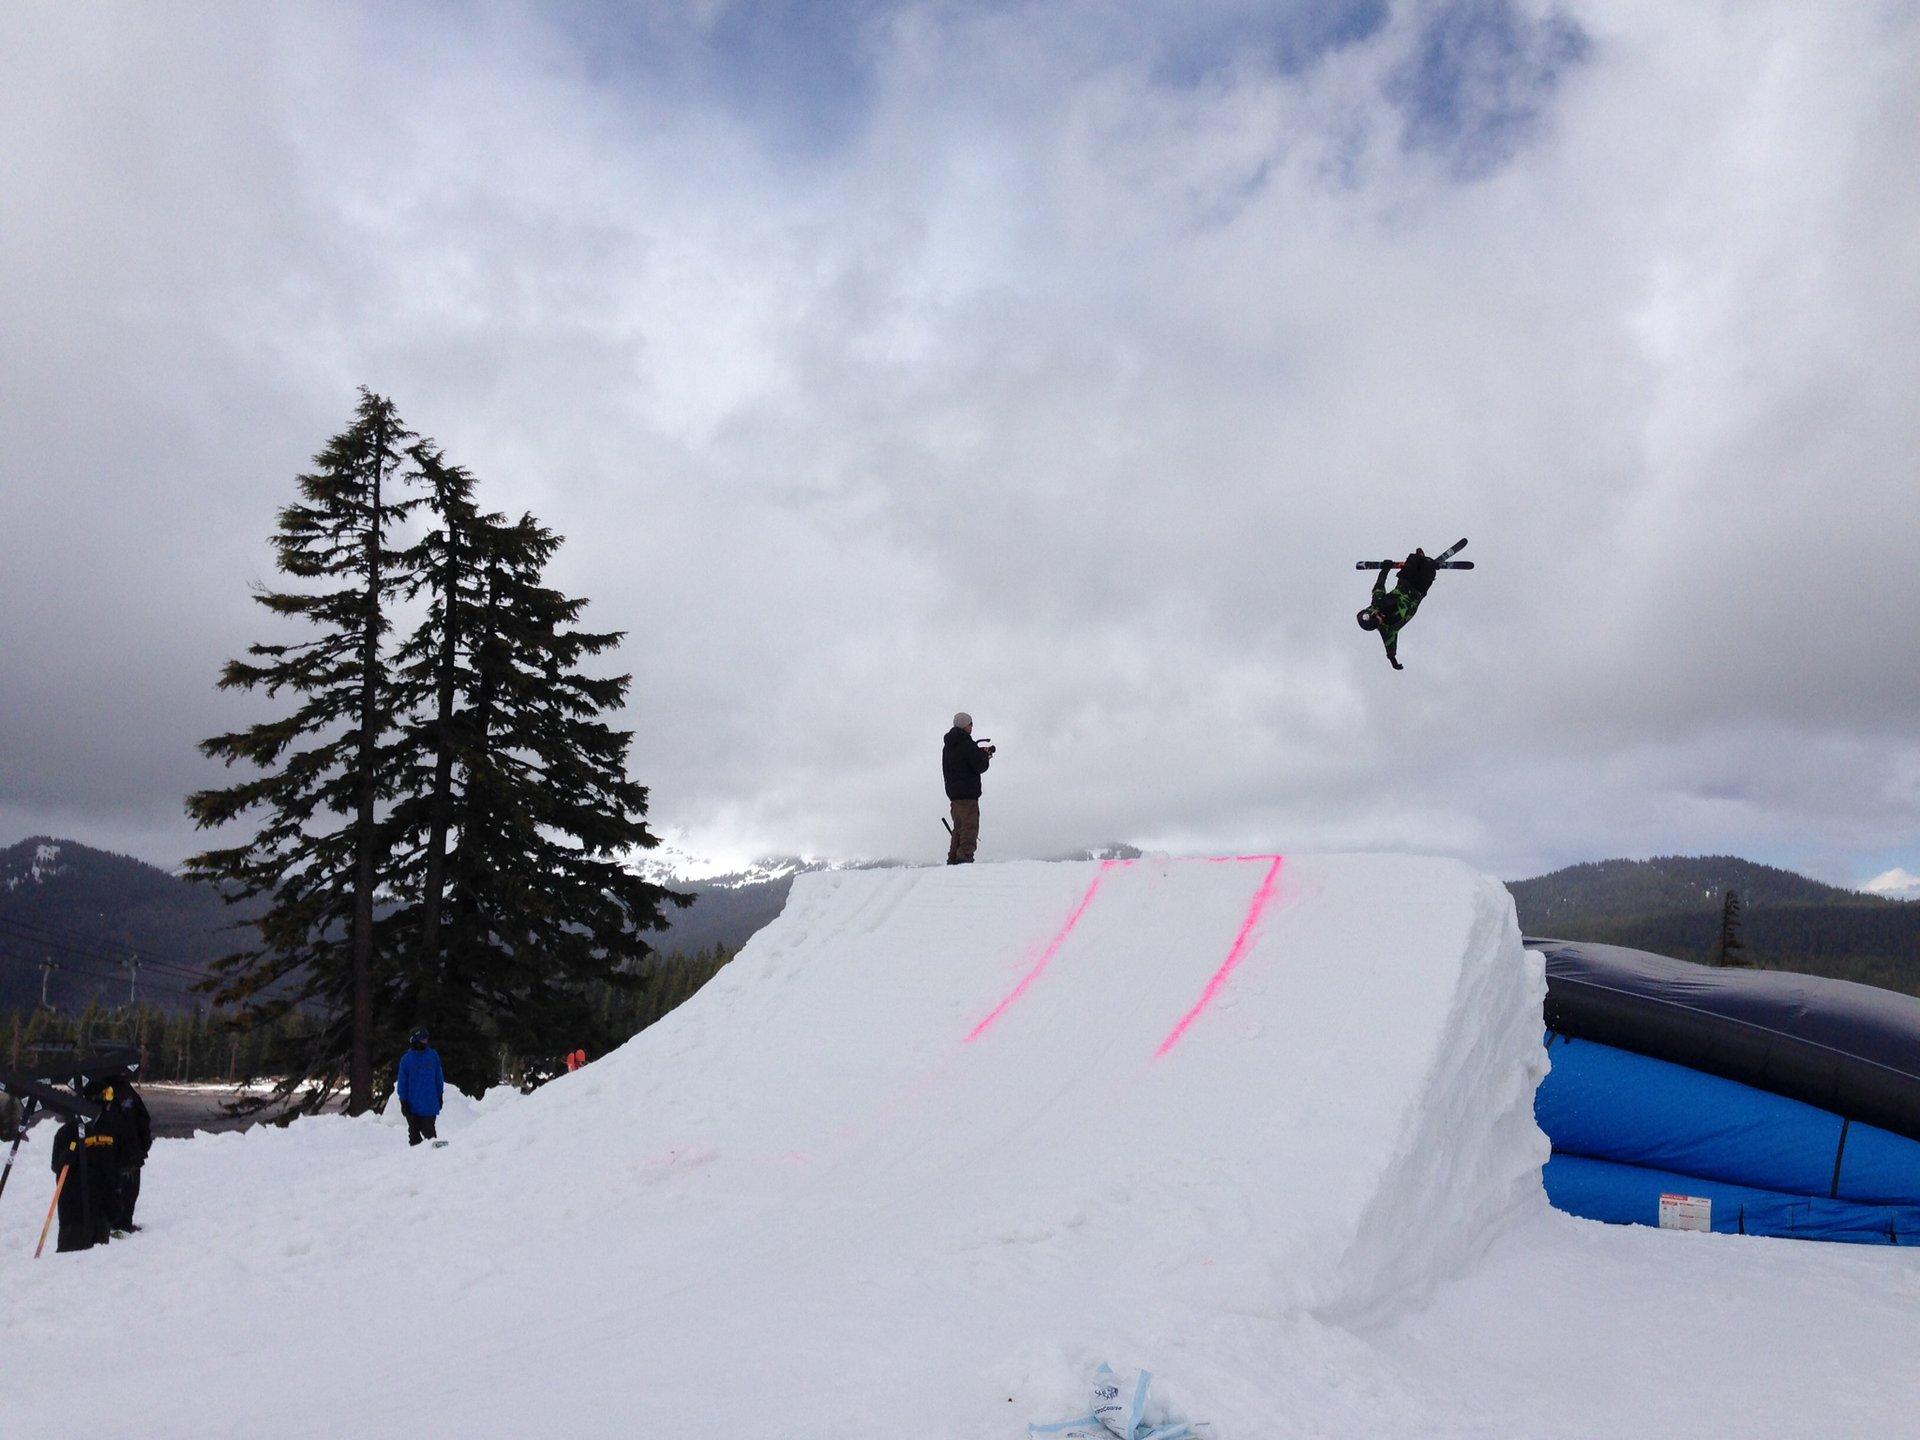 Pulling off my ski..